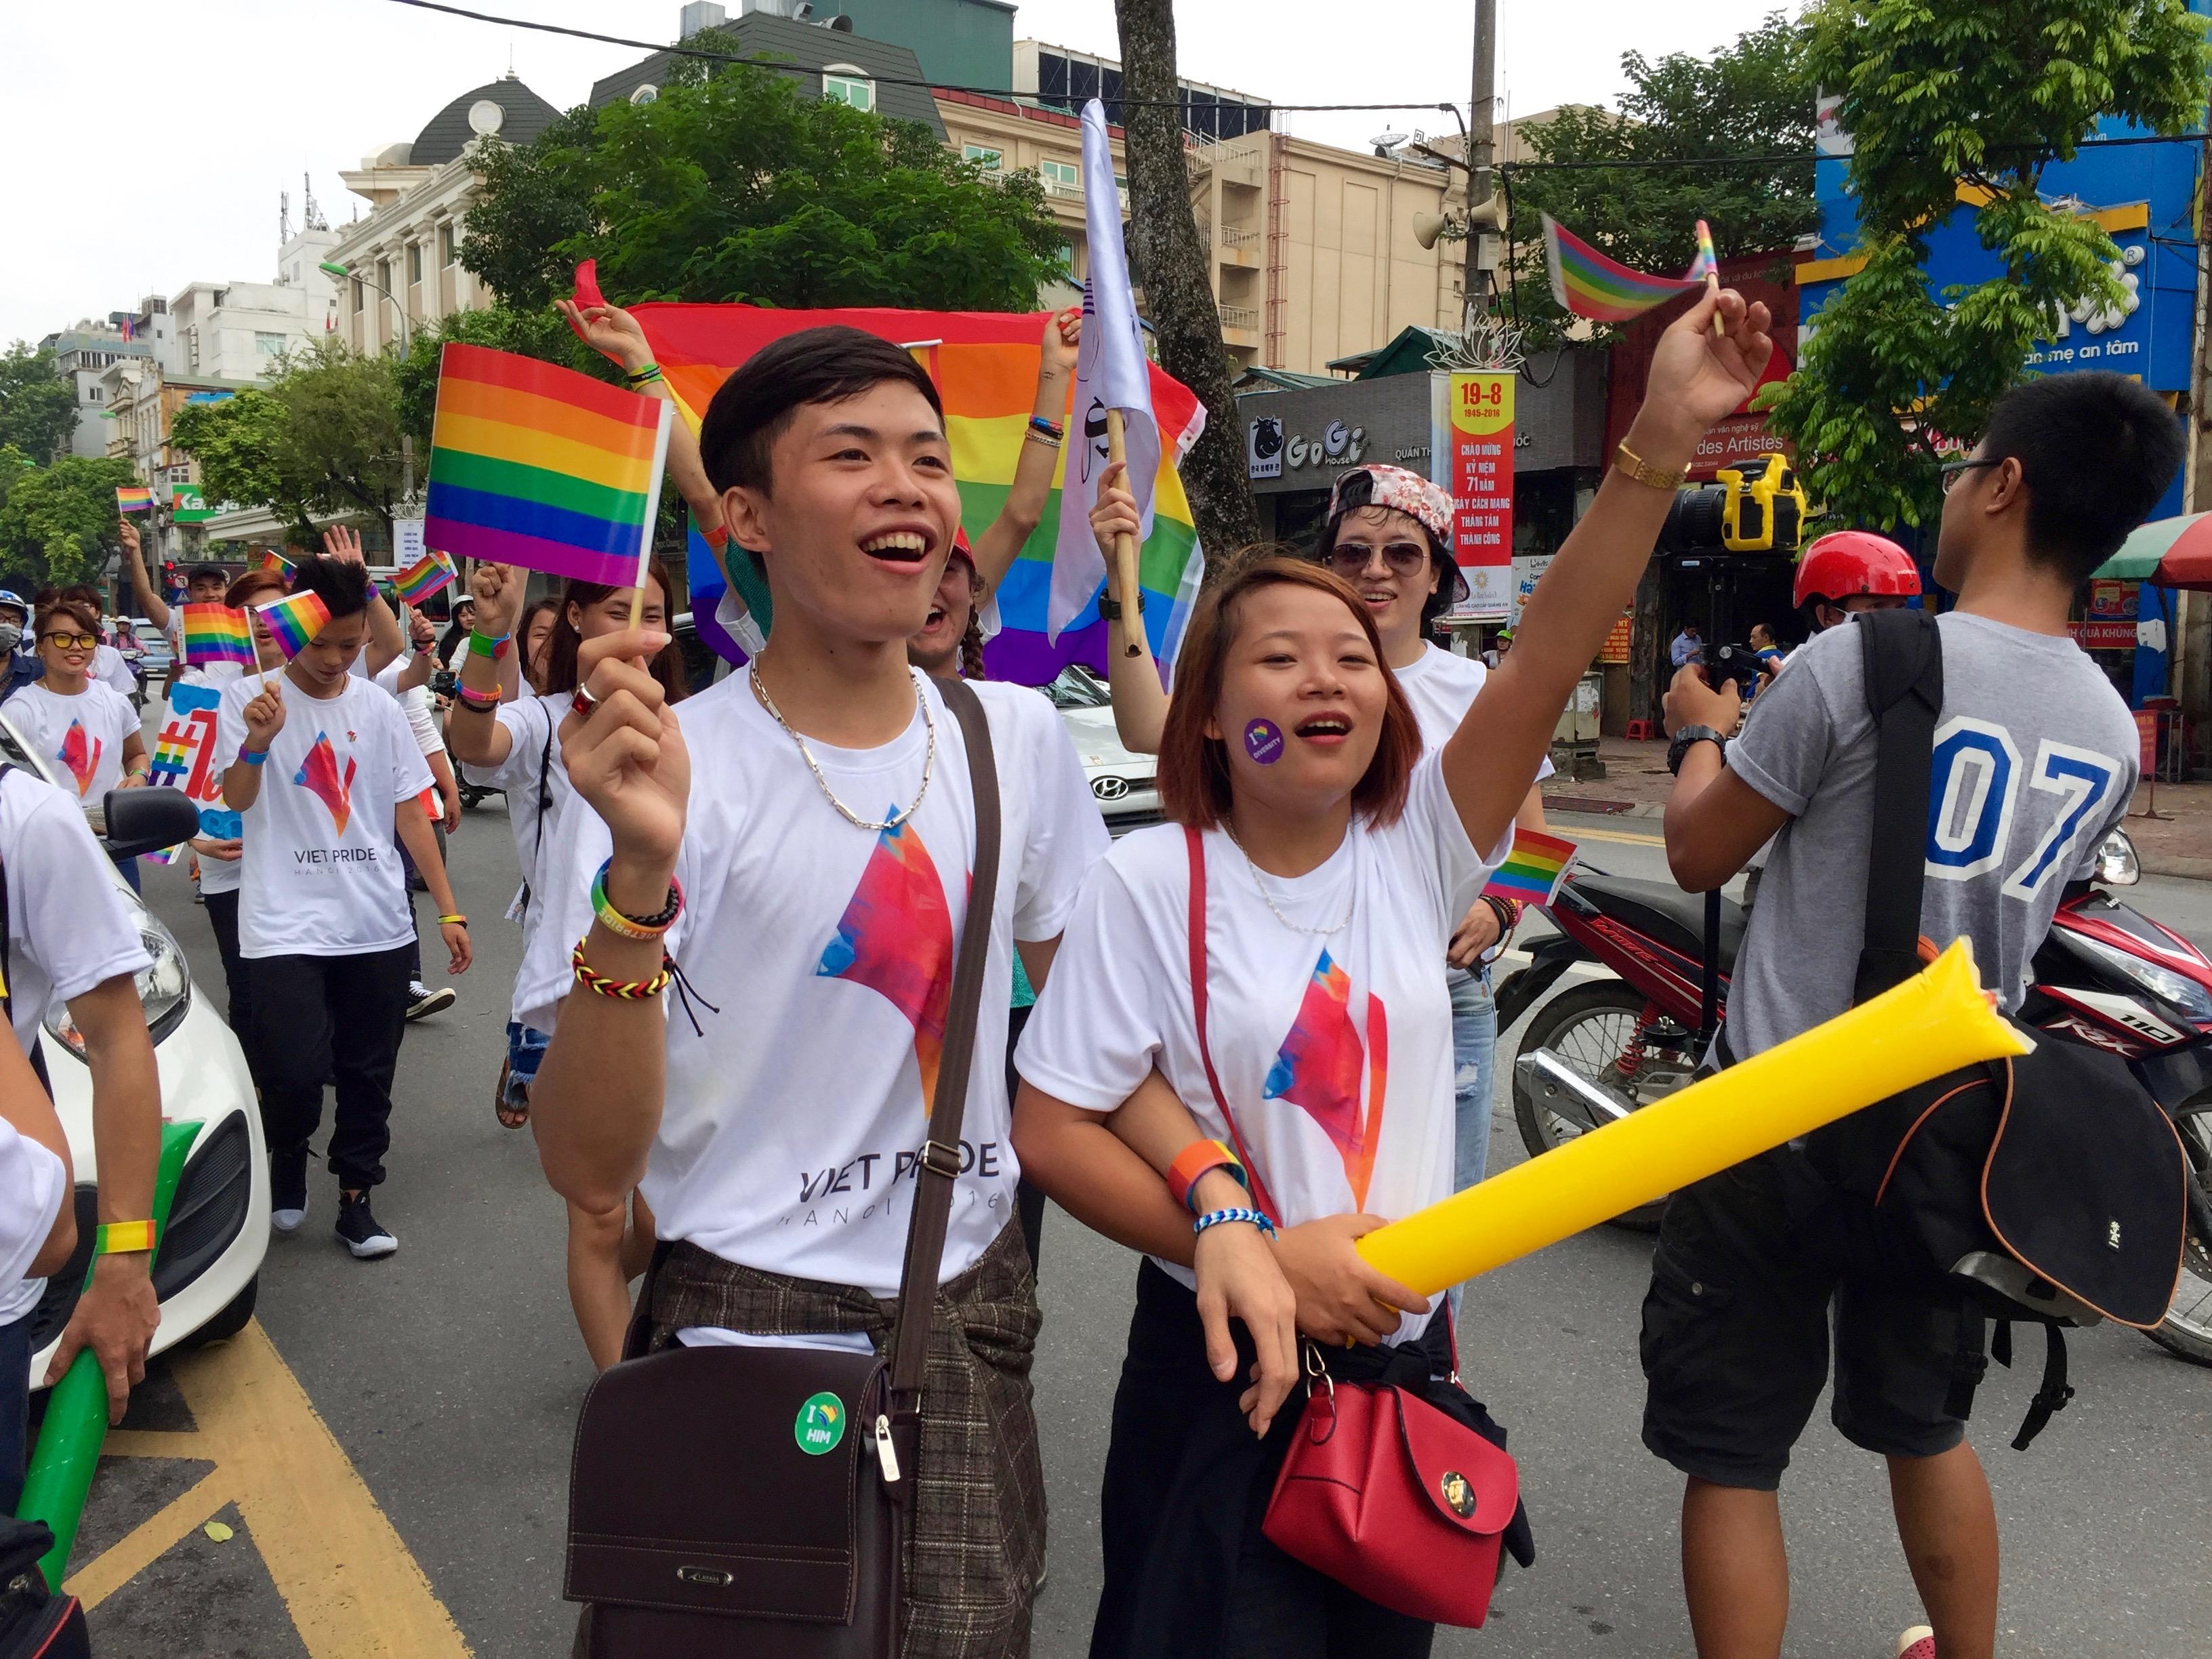 File:Viet Pride 2016 in Hanoi (29100137996).jpg - Wikimedia Commons